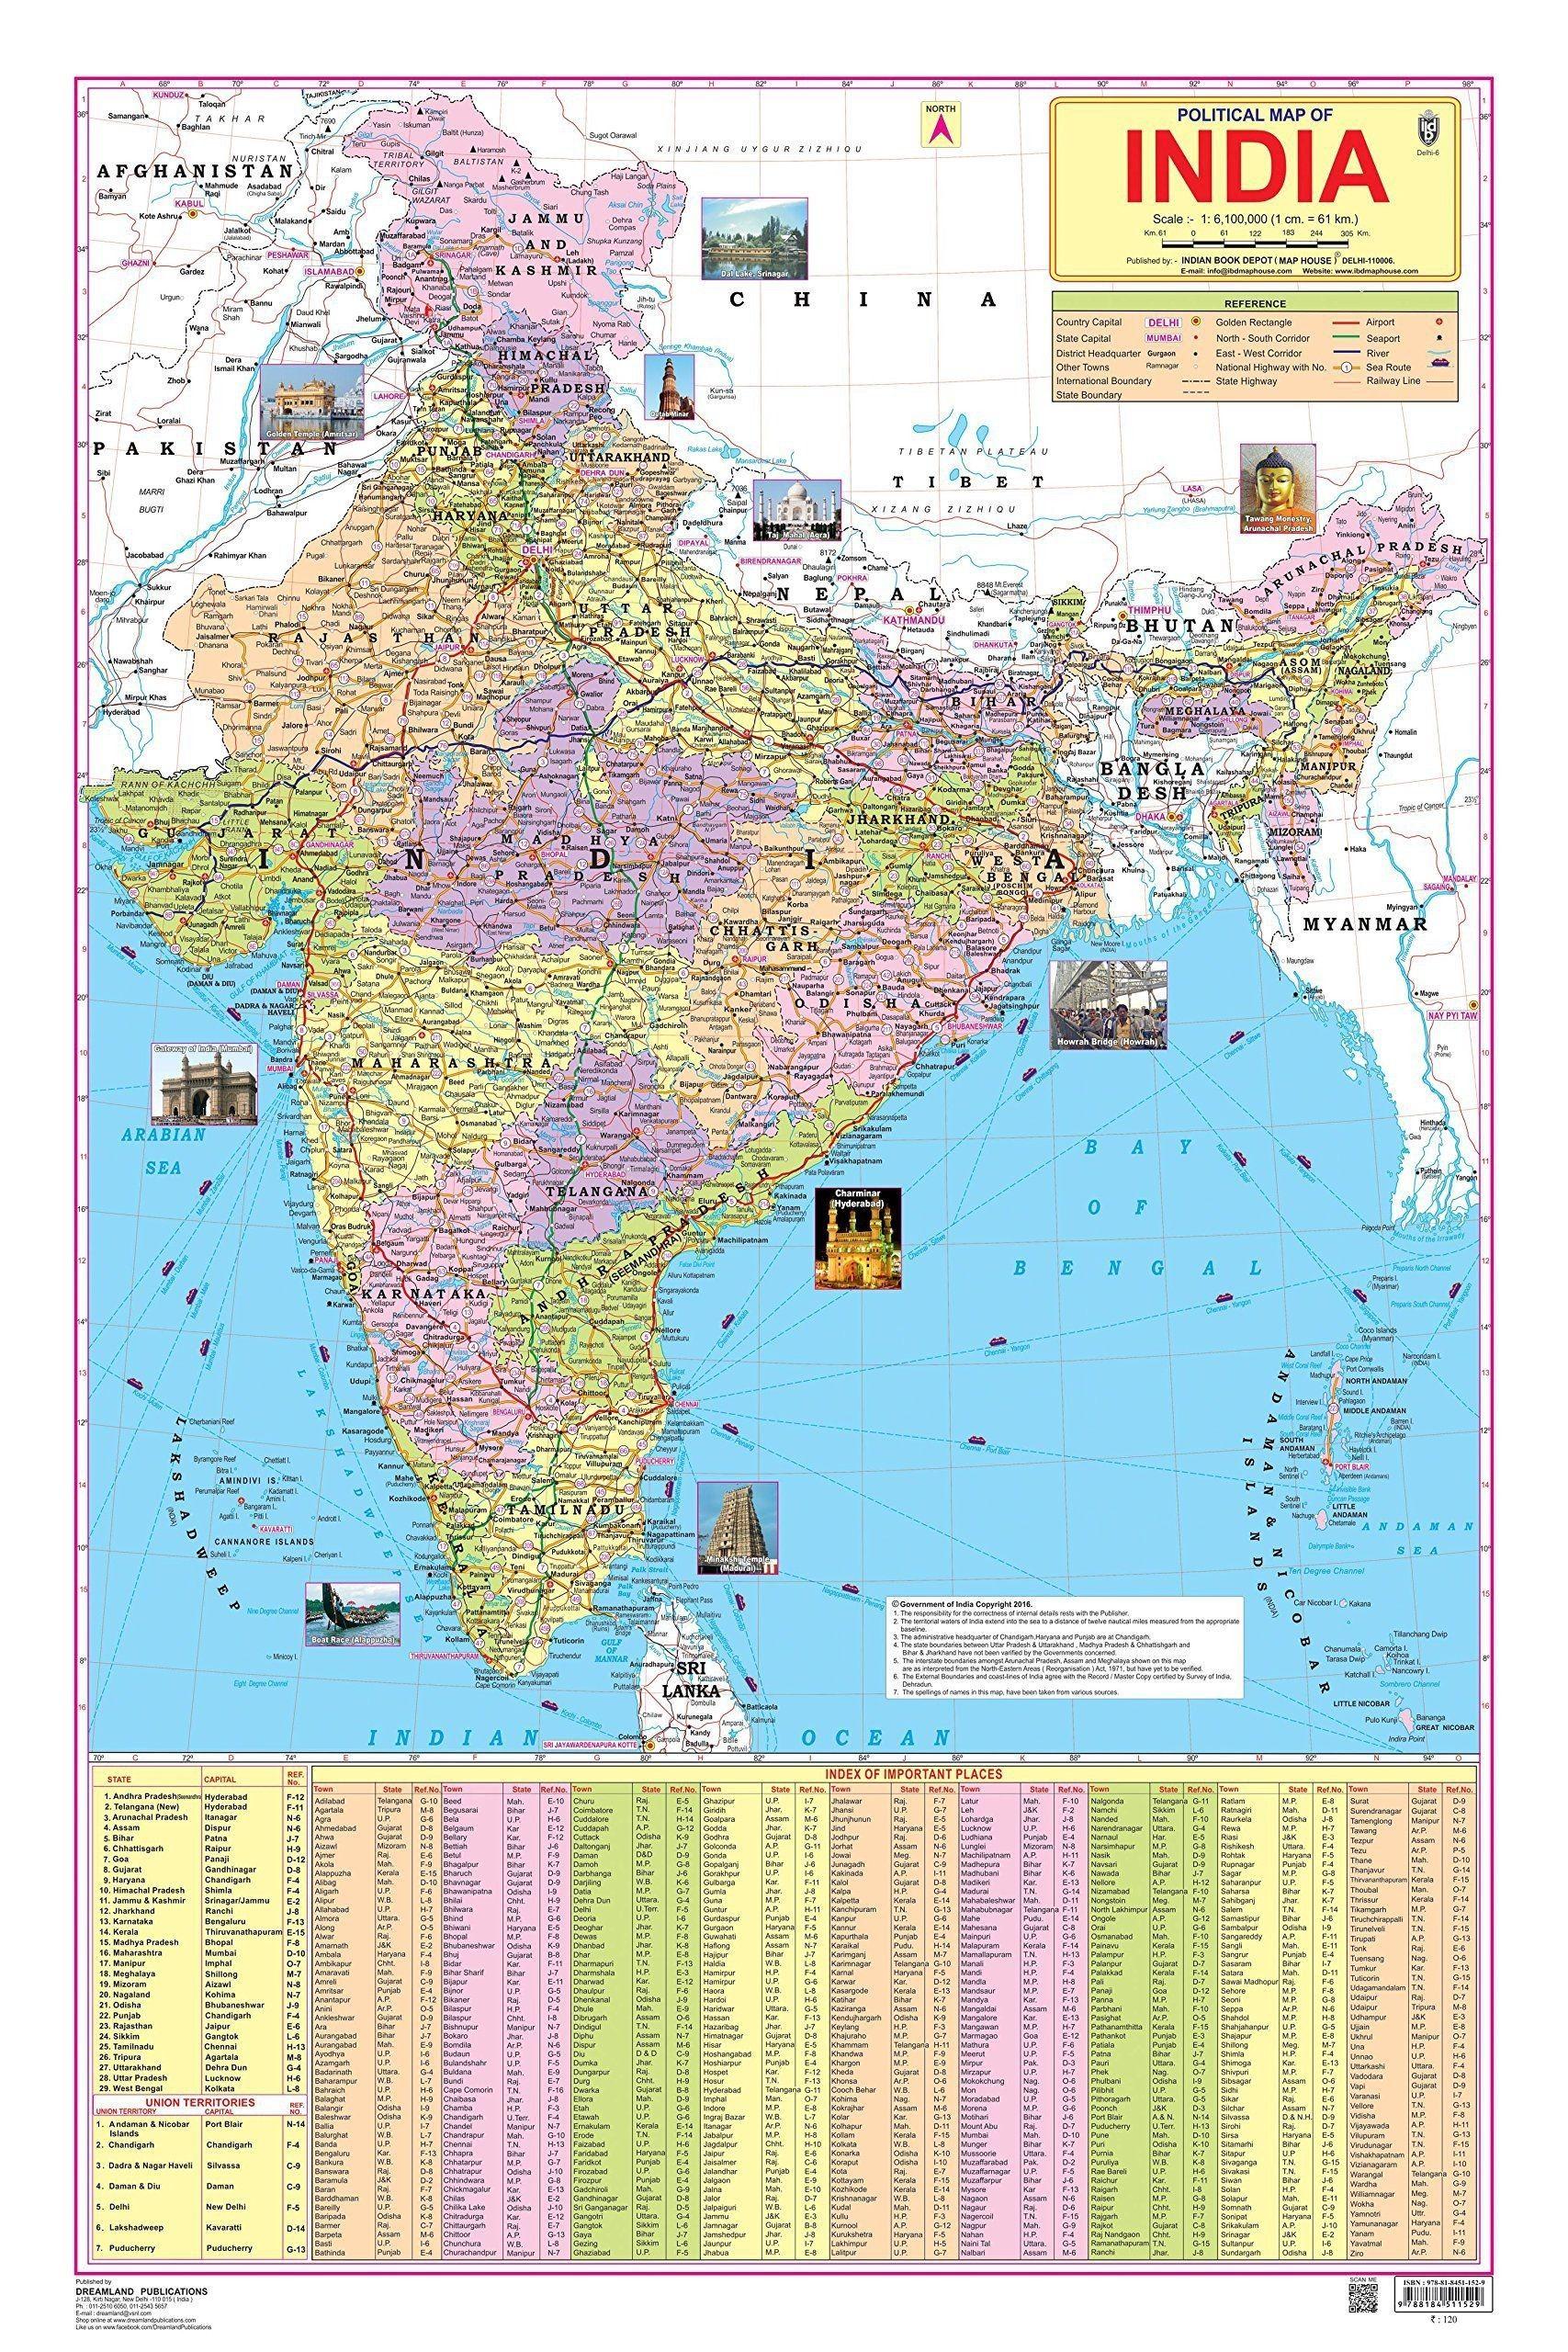 India Map Hd Pdf Download Map India Ka Map India River Map A4 Size Pdf Telangana Political Map 31 Districts Names India Map India World Map World Geography Map